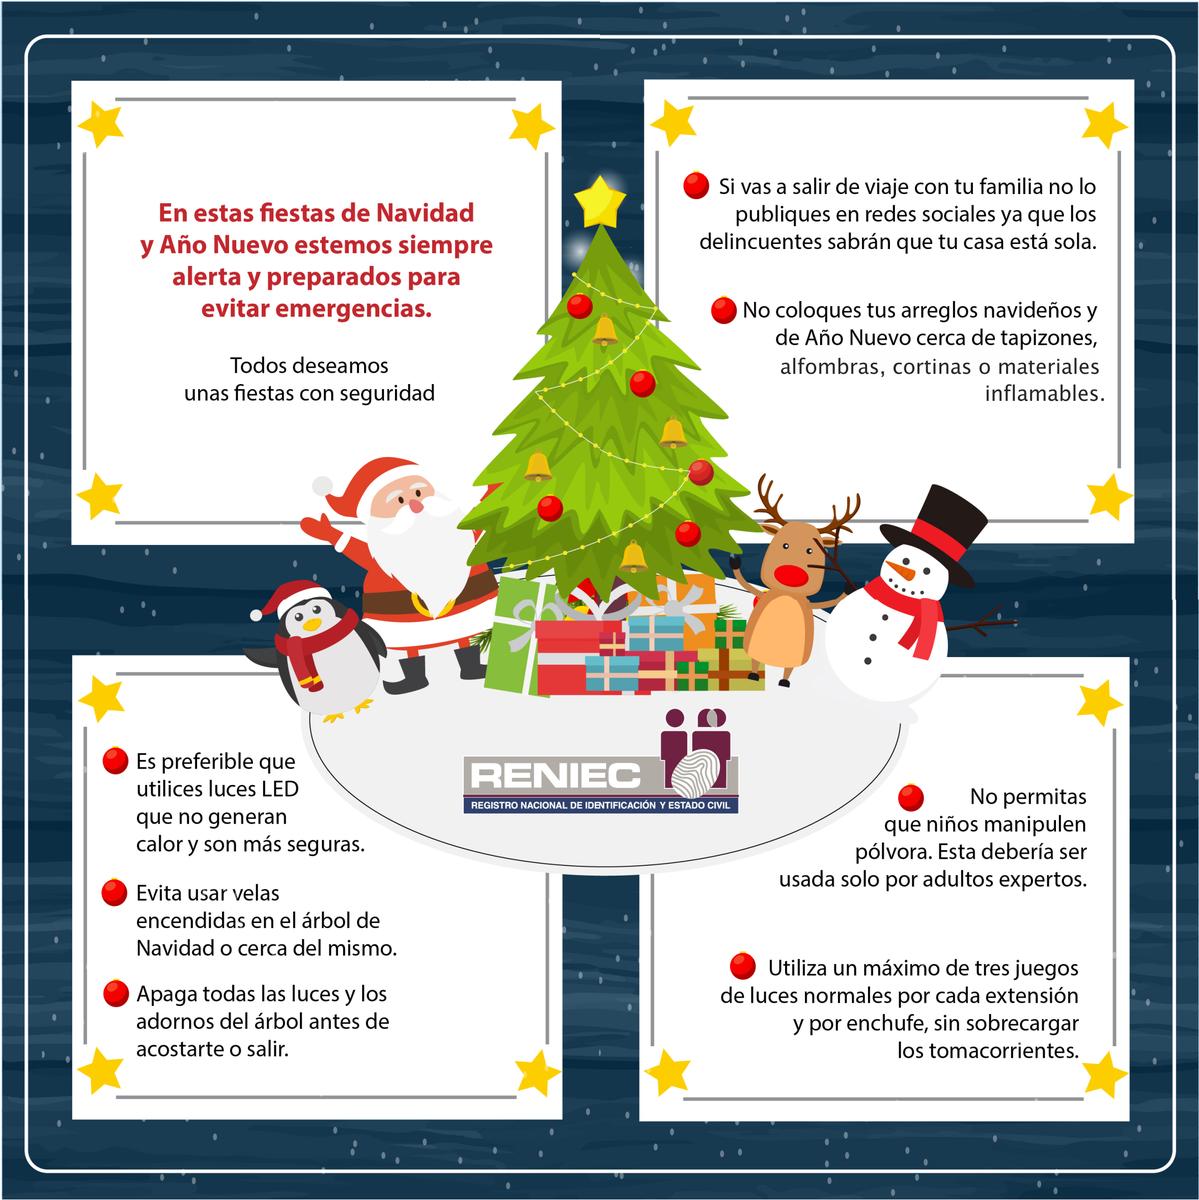 3a53ac0c489 Recuerda usar correctamente las luces y adornos navideños para evitar  accidentes… https   t.co Pg9aqhYaE5